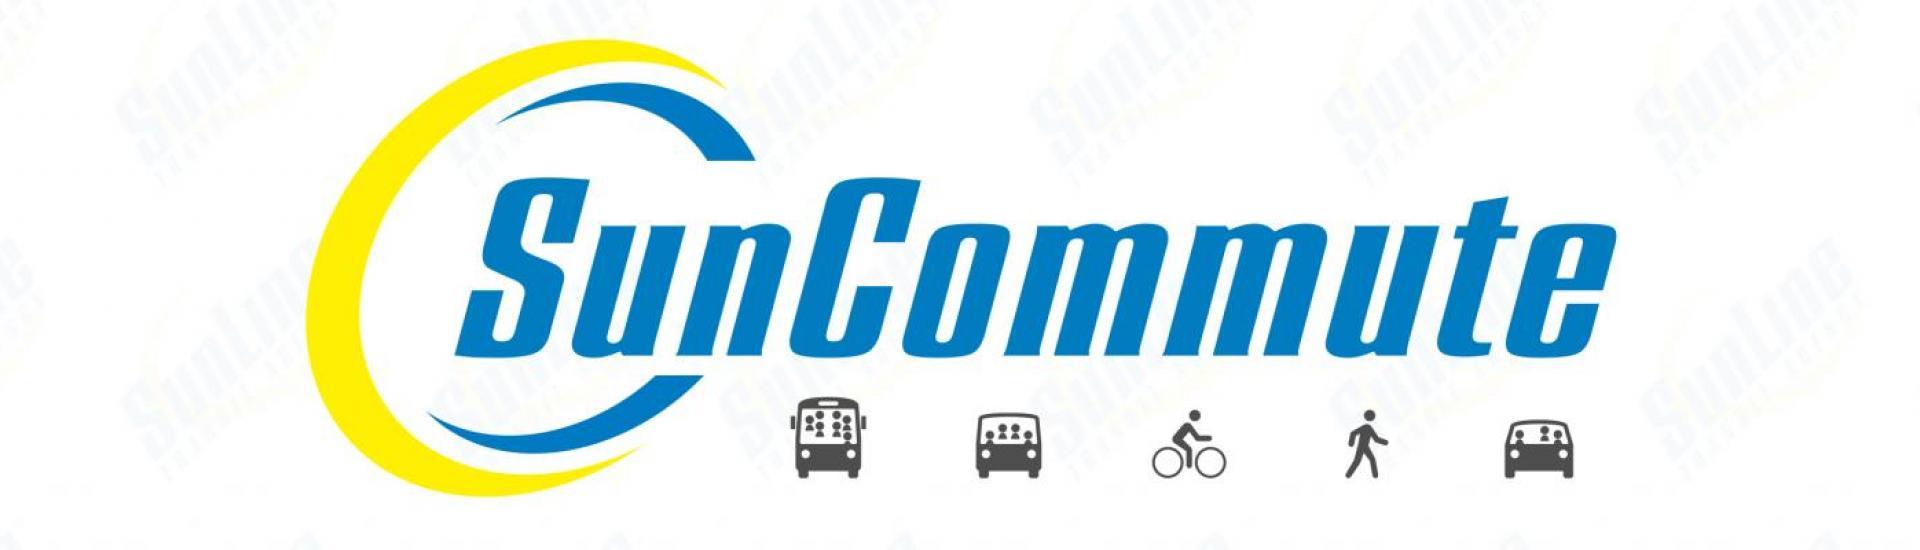 SunCommute Logo